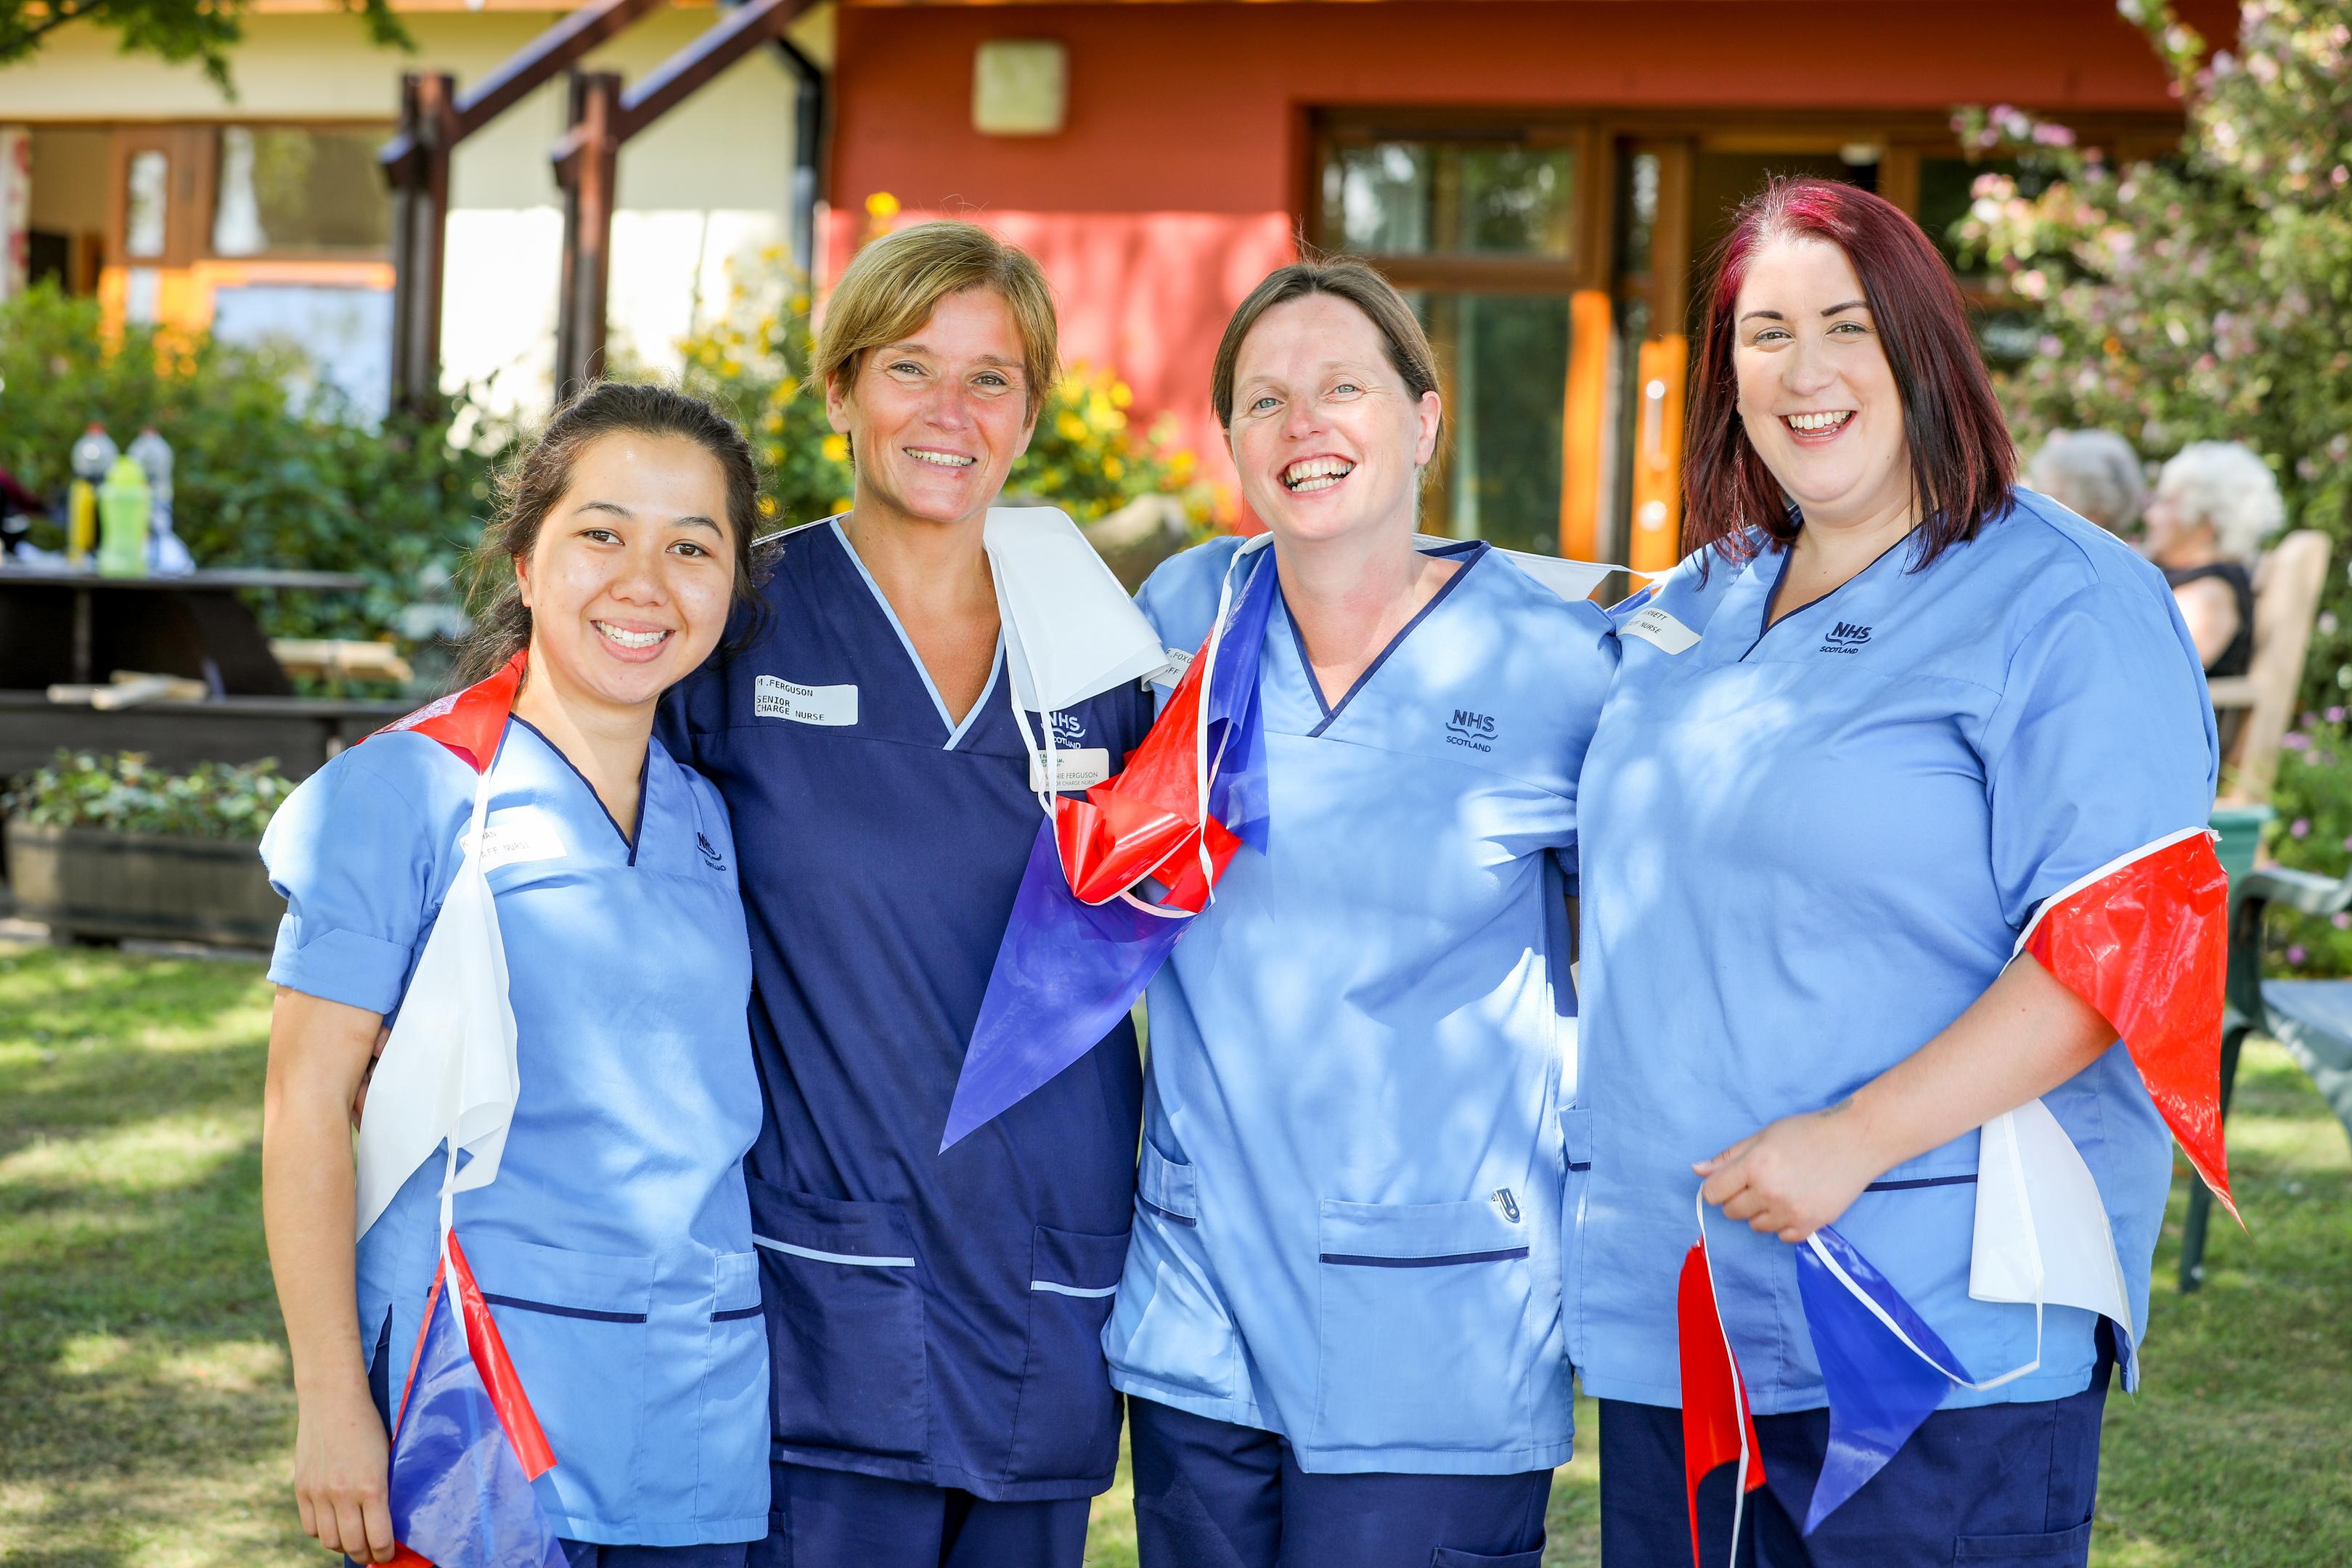 Some of the Roxburghe staff. Staff nurse Kim Chan, senior charge nurse Marnie Ferguson, staff nurse Fiona Foxon and staff nurse Robyn Barnett.